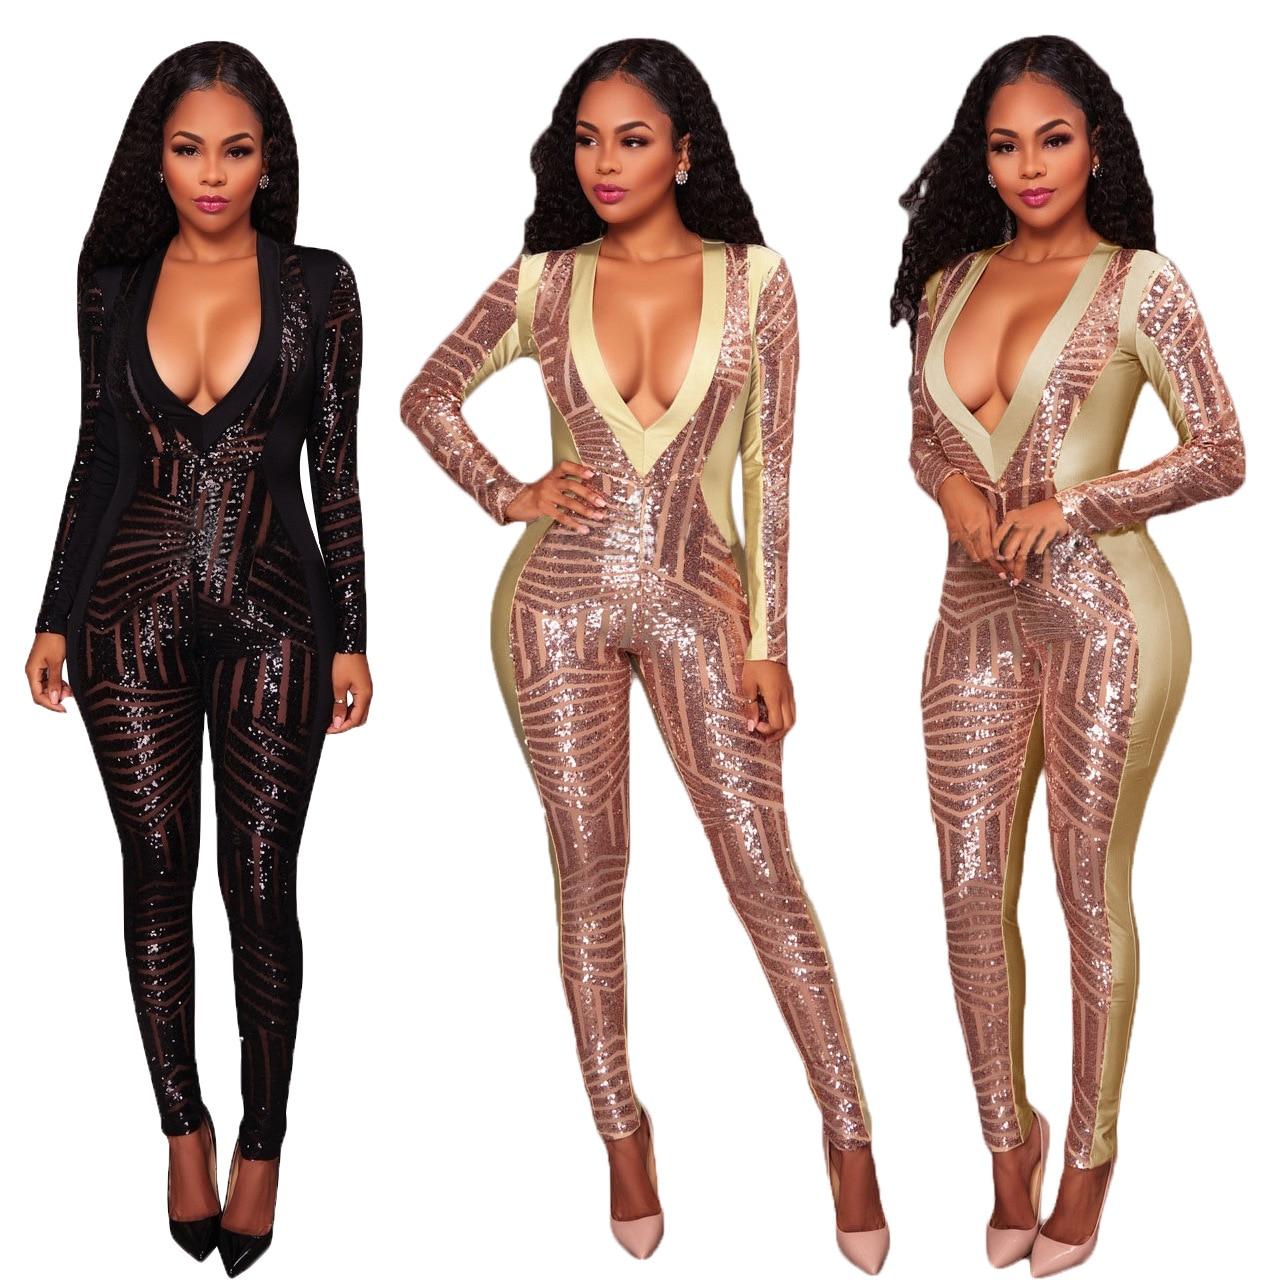 1d43af2ffebc Rompers Womens Jumpsuit Shorts Lace Bodysuit Overalls For Women Romper Body  Suit Overall Suits Casual Kombinezon Damski Elegant Sheer Bodysuit Roupa ...